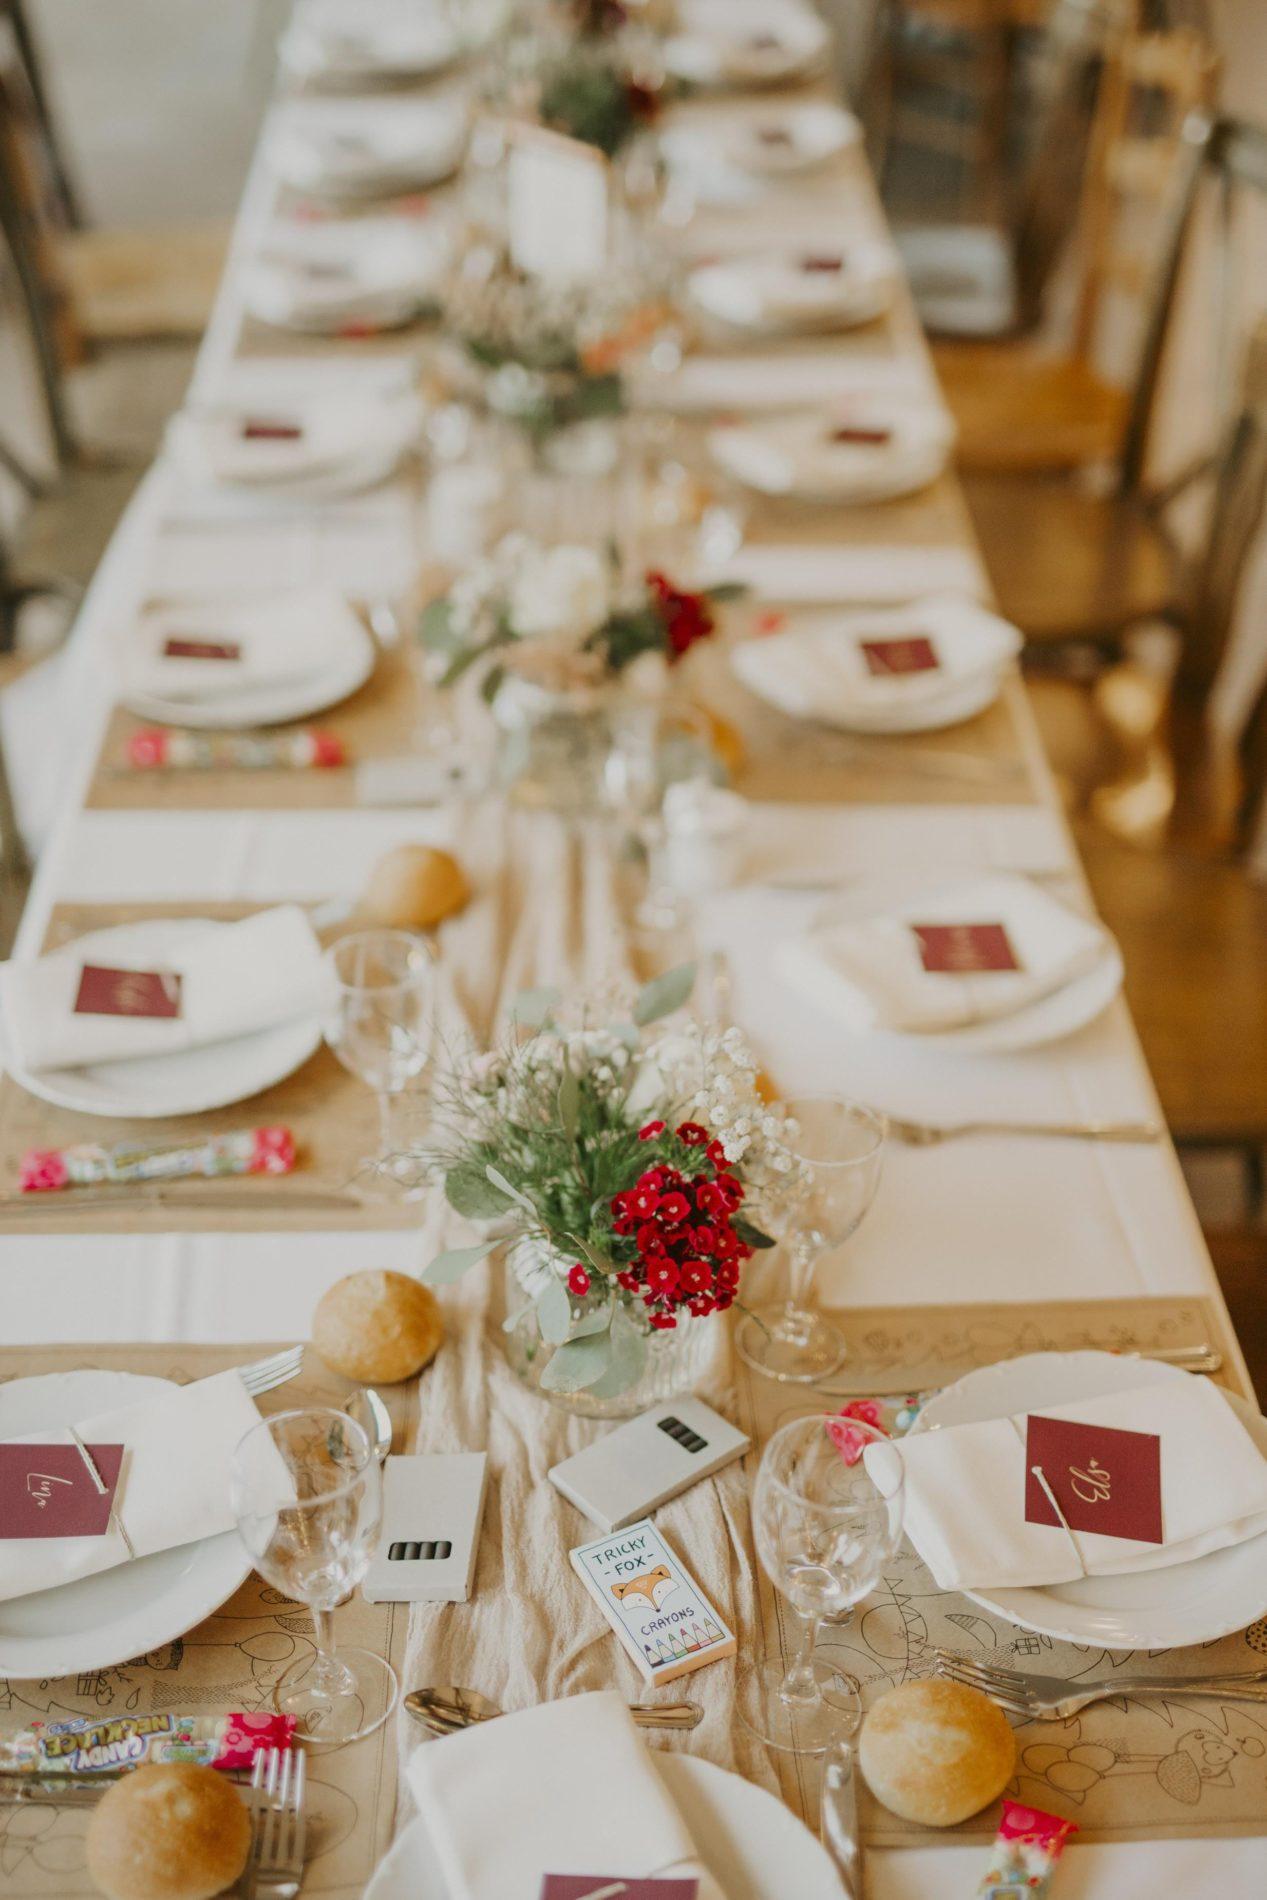 0149_04-CelineSereivuth-151-obonheurdesdames-decoration-mariage-location-Jordane-Chaillou